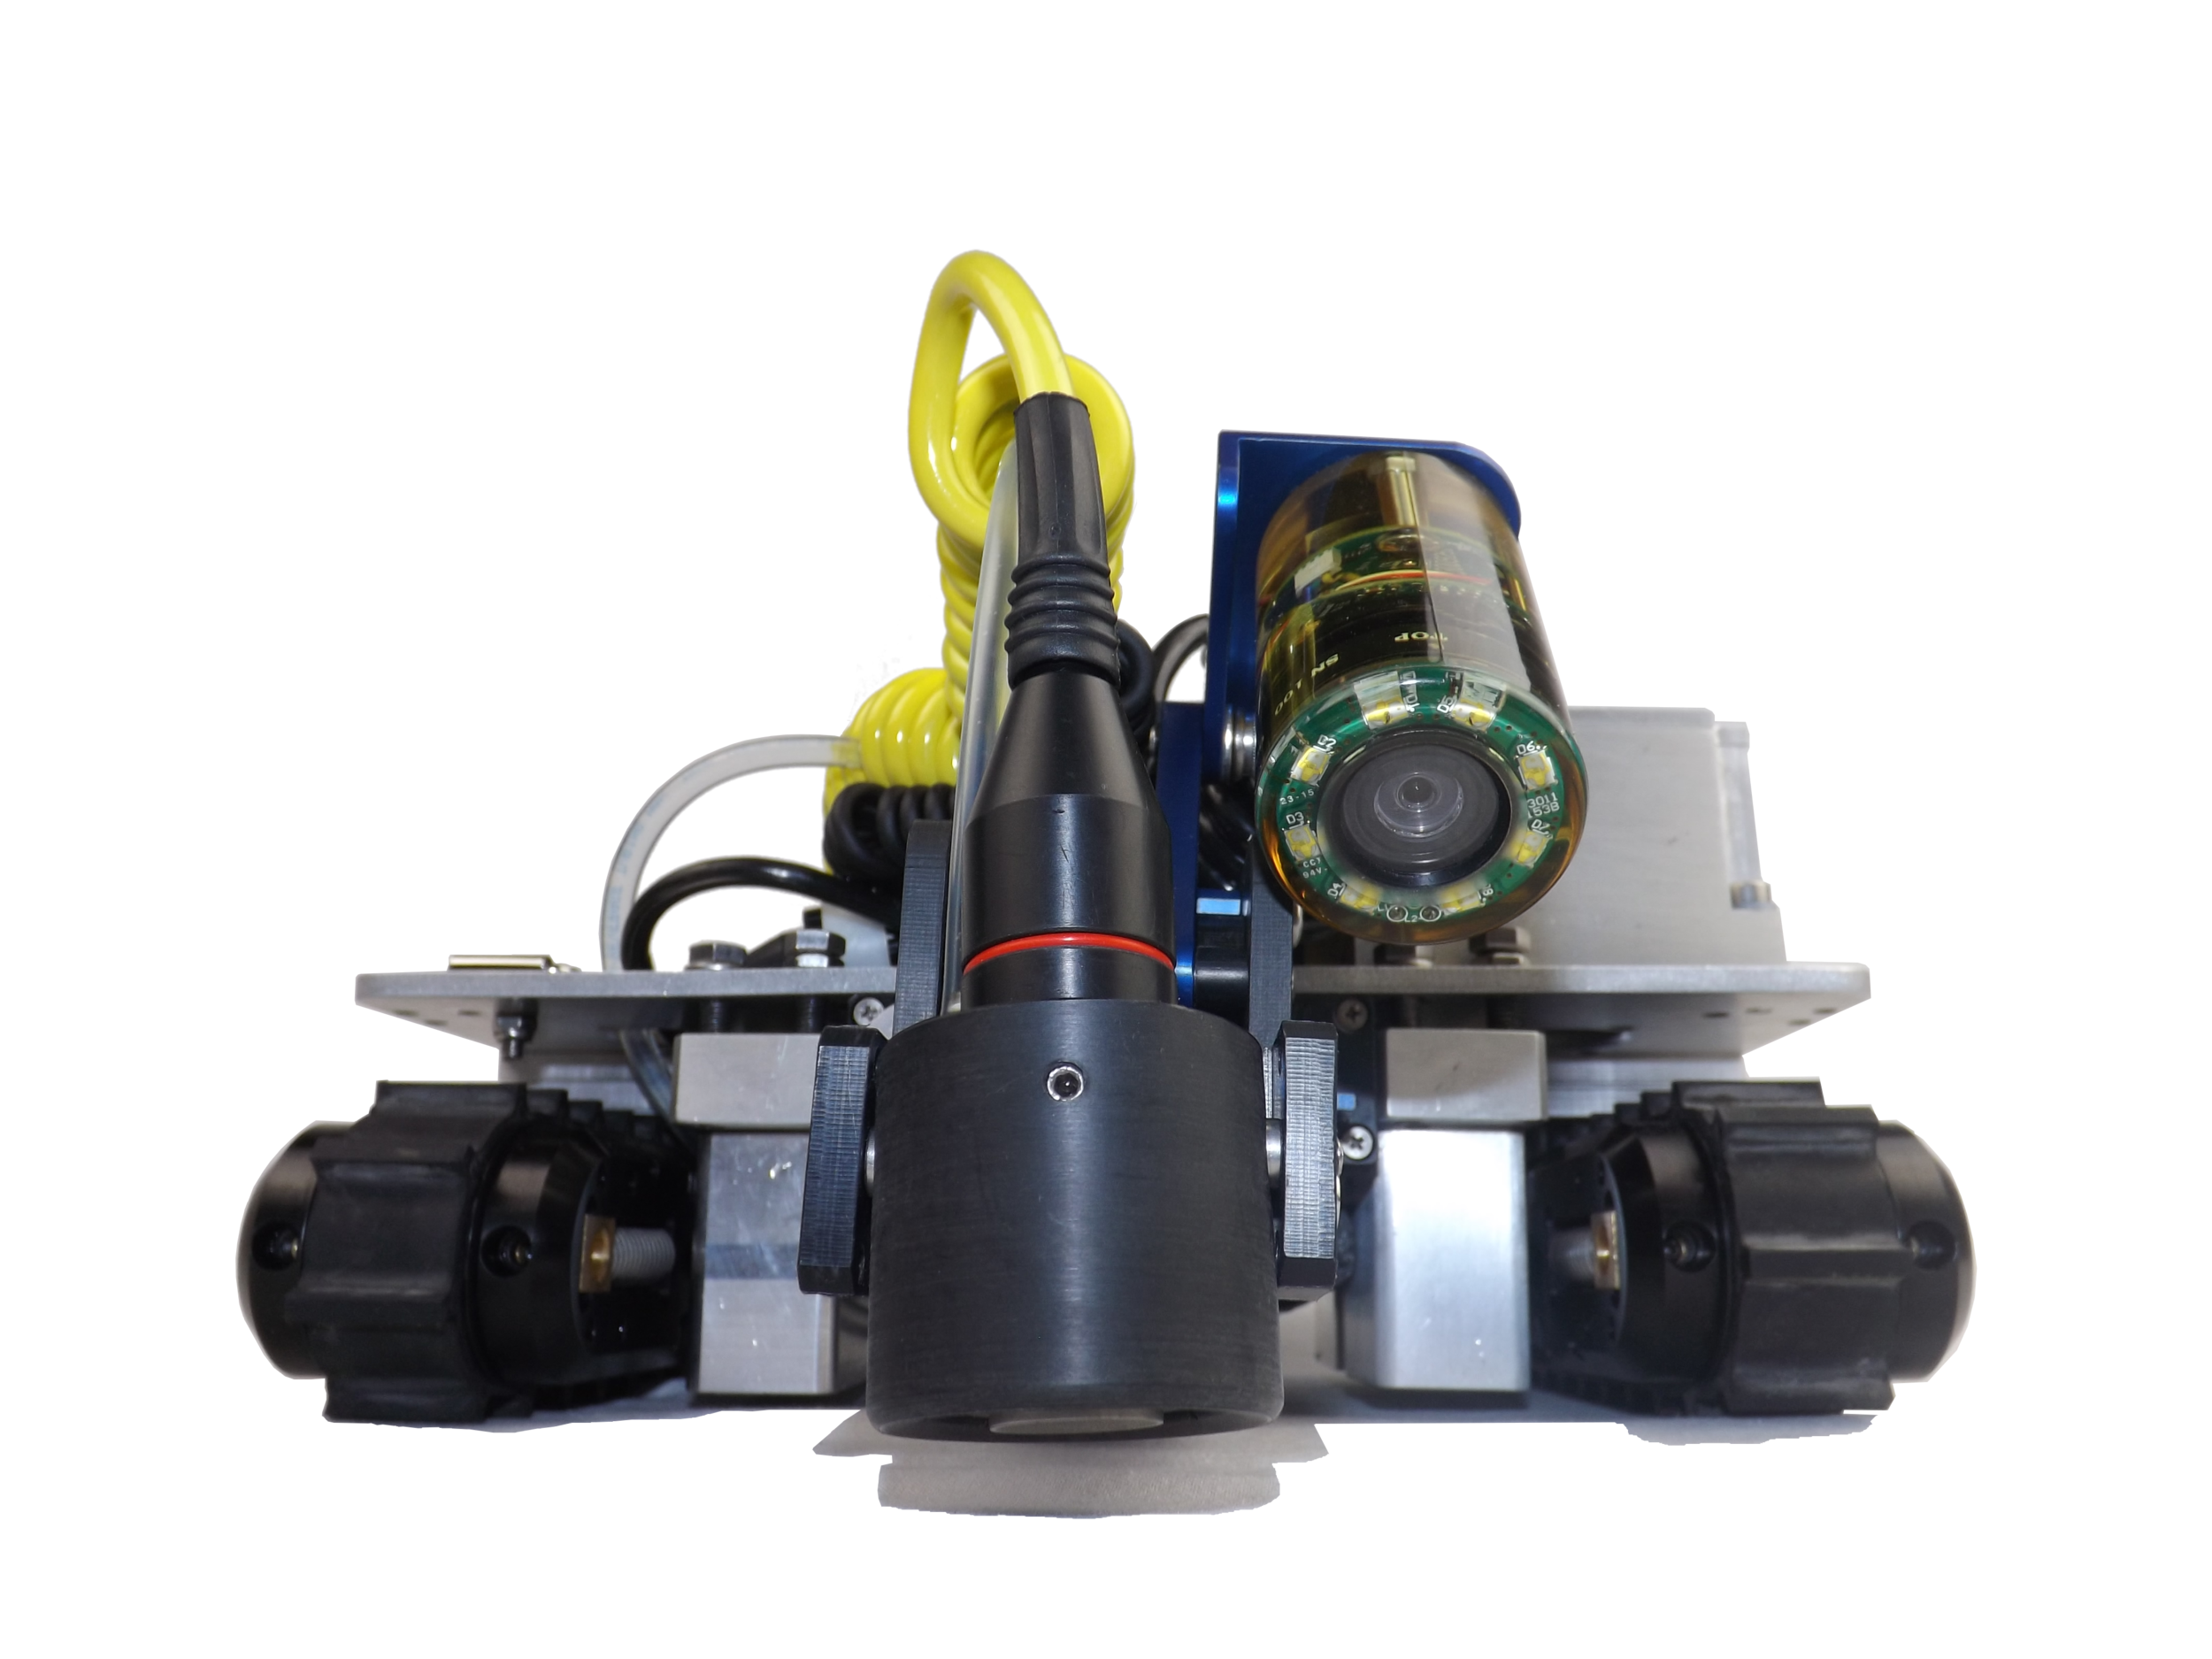 MaggUT™ - Marine Miniature, waterproof Magnetic Crawler